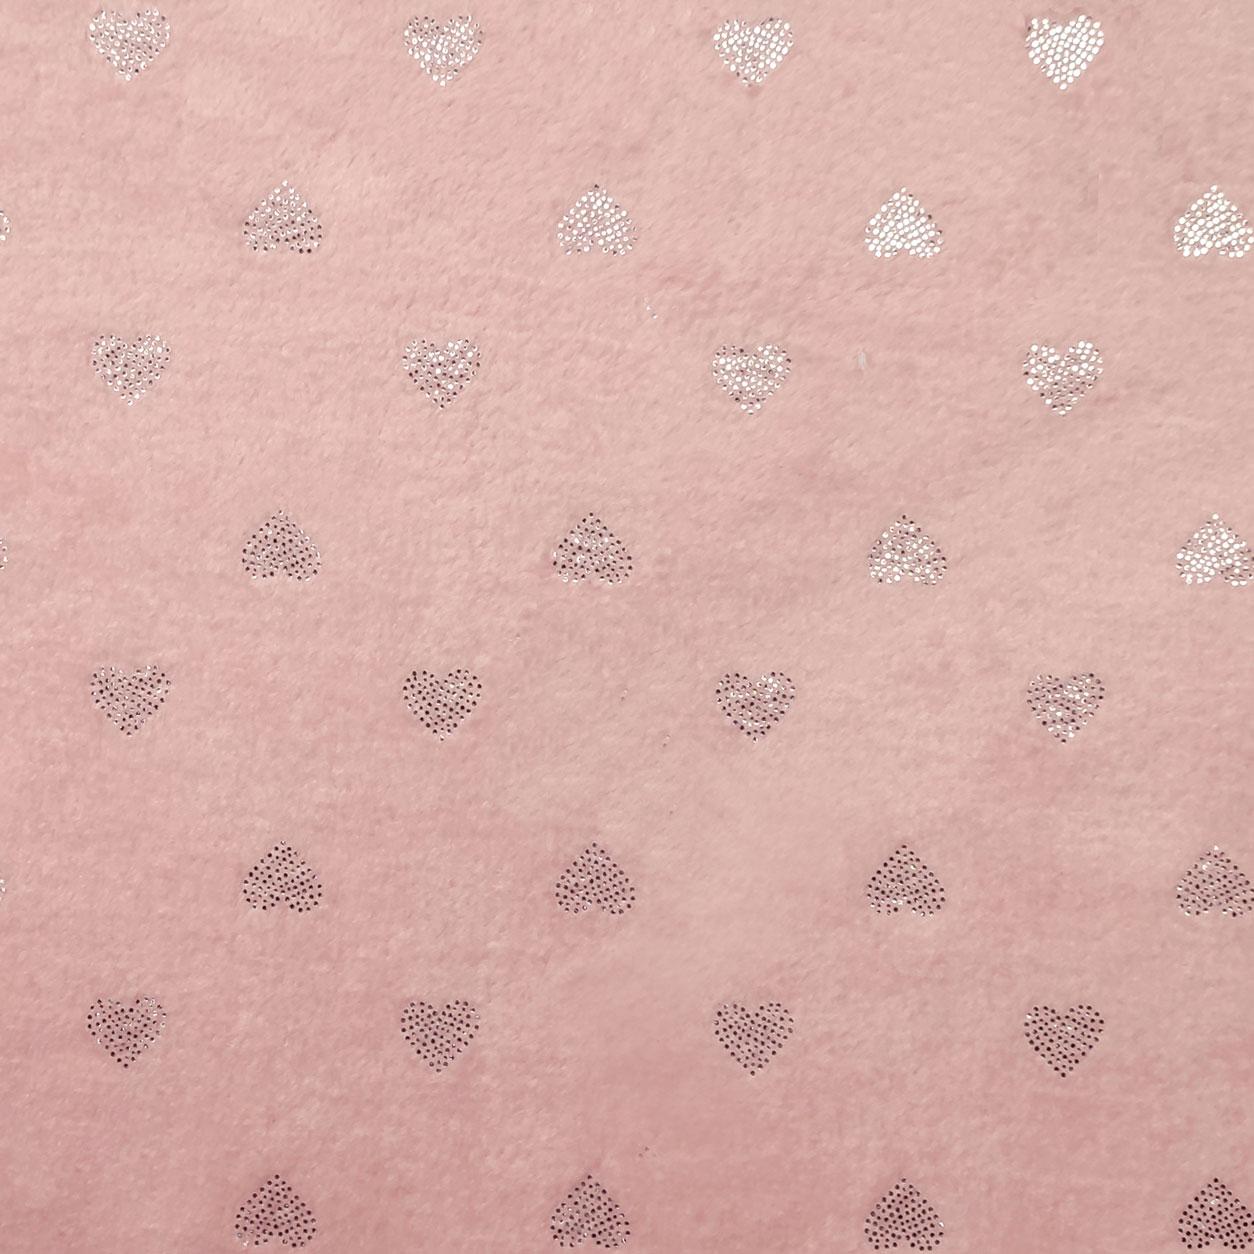 Pile Mano Cachemire Rosa Baby Cuoricini Argento